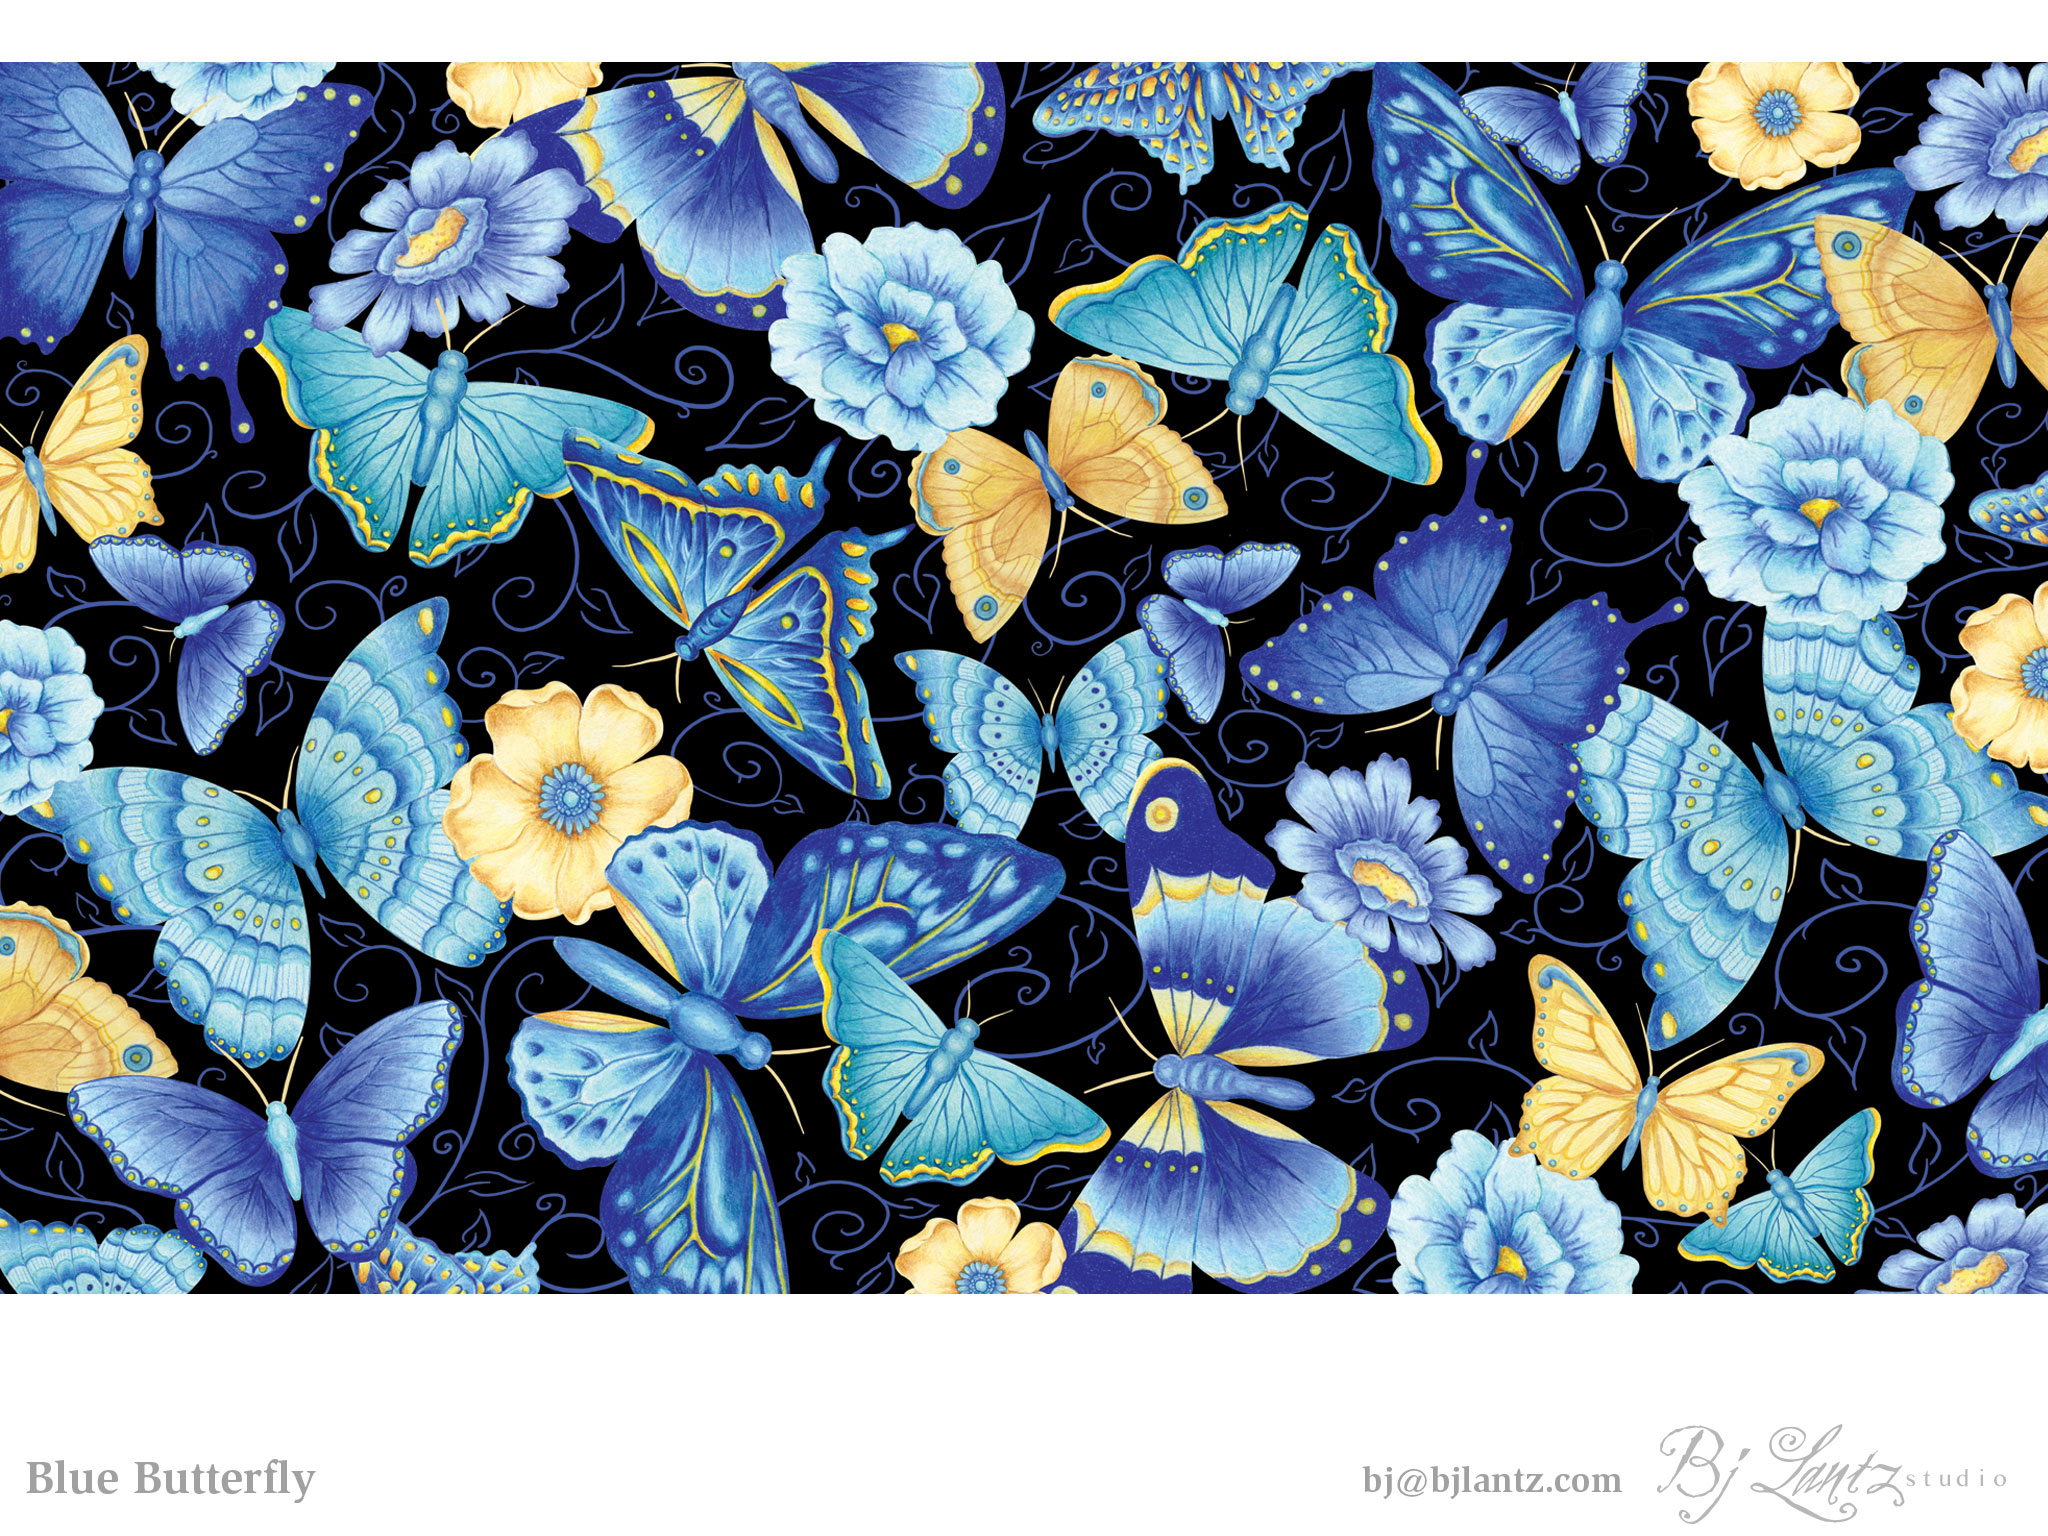 BlueButterfly_BJLantz_1.jpg